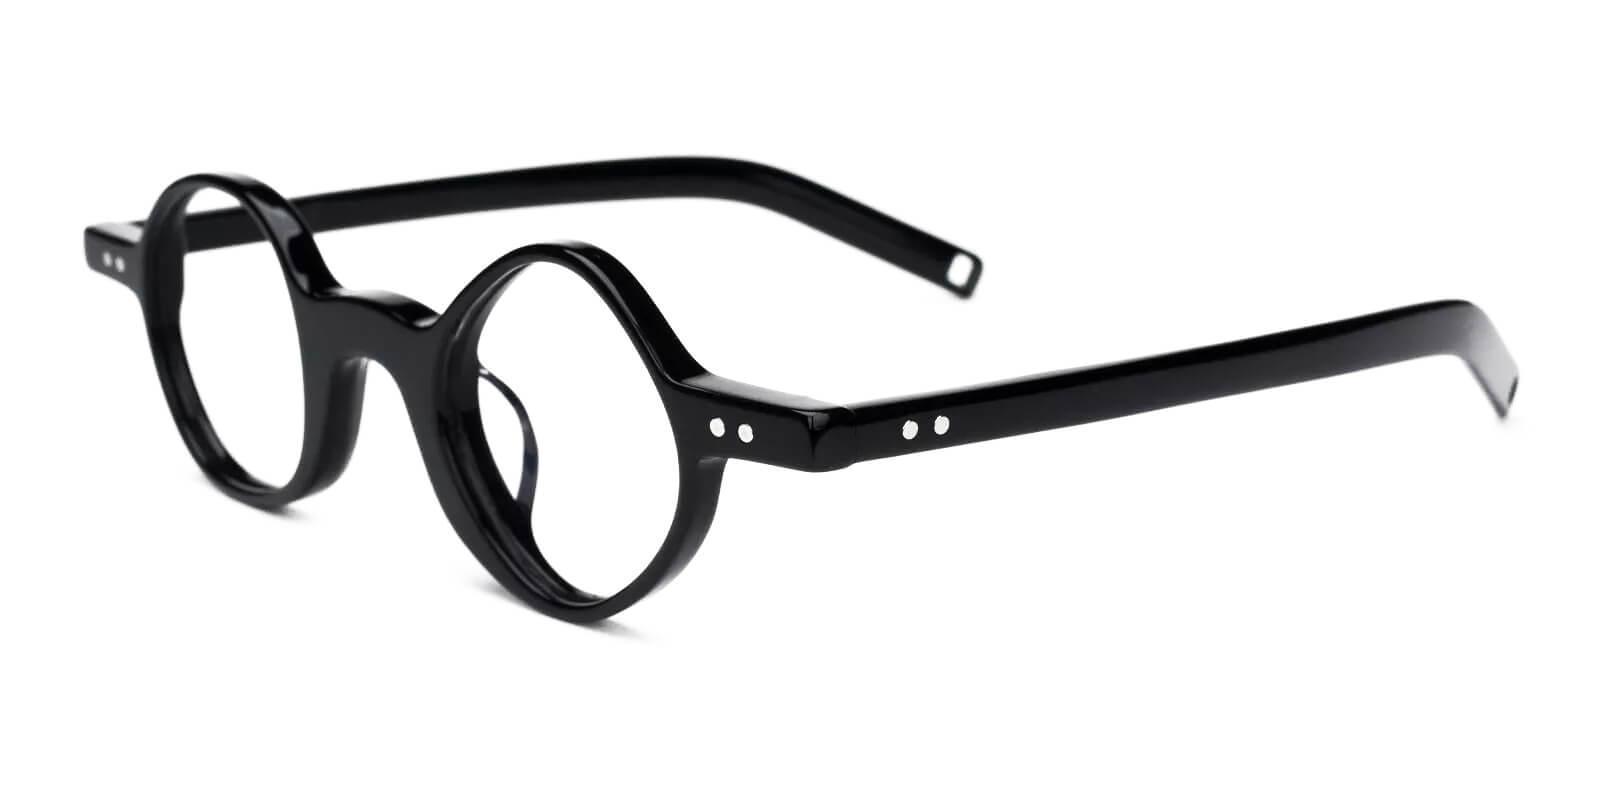 Tersaki Black TR Eyeglasses , Fashion , NosePads Frames from ABBE Glasses